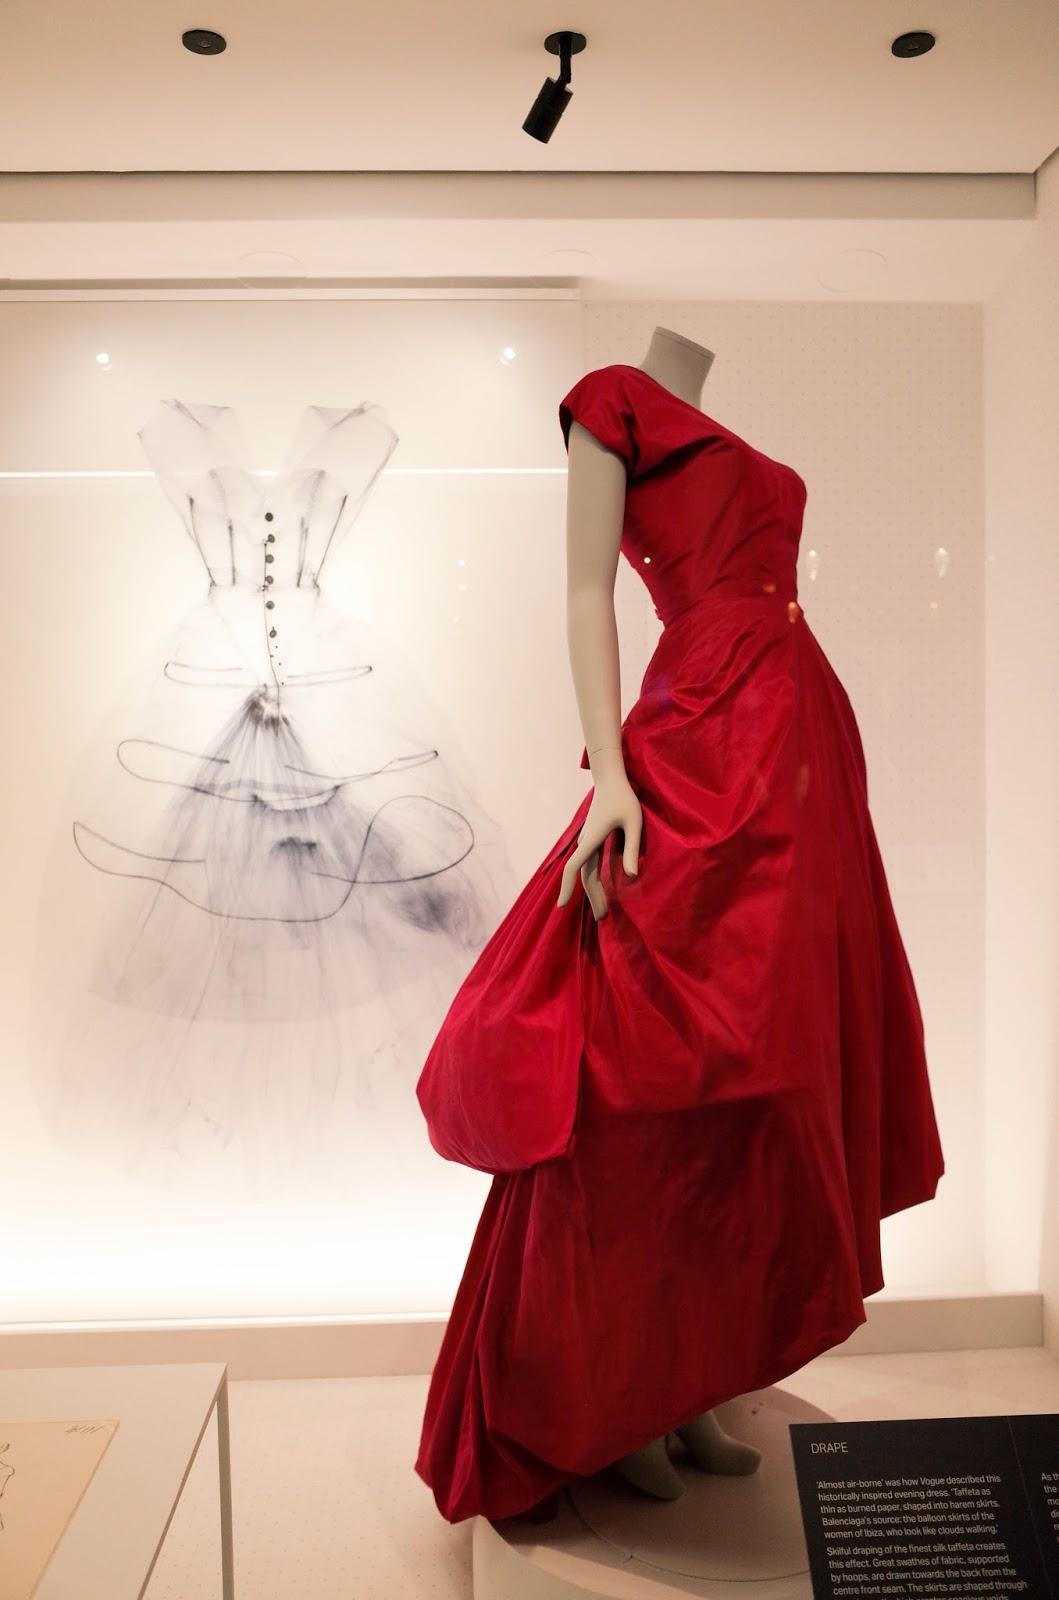 Balenciaga at the V&A | Martha Love